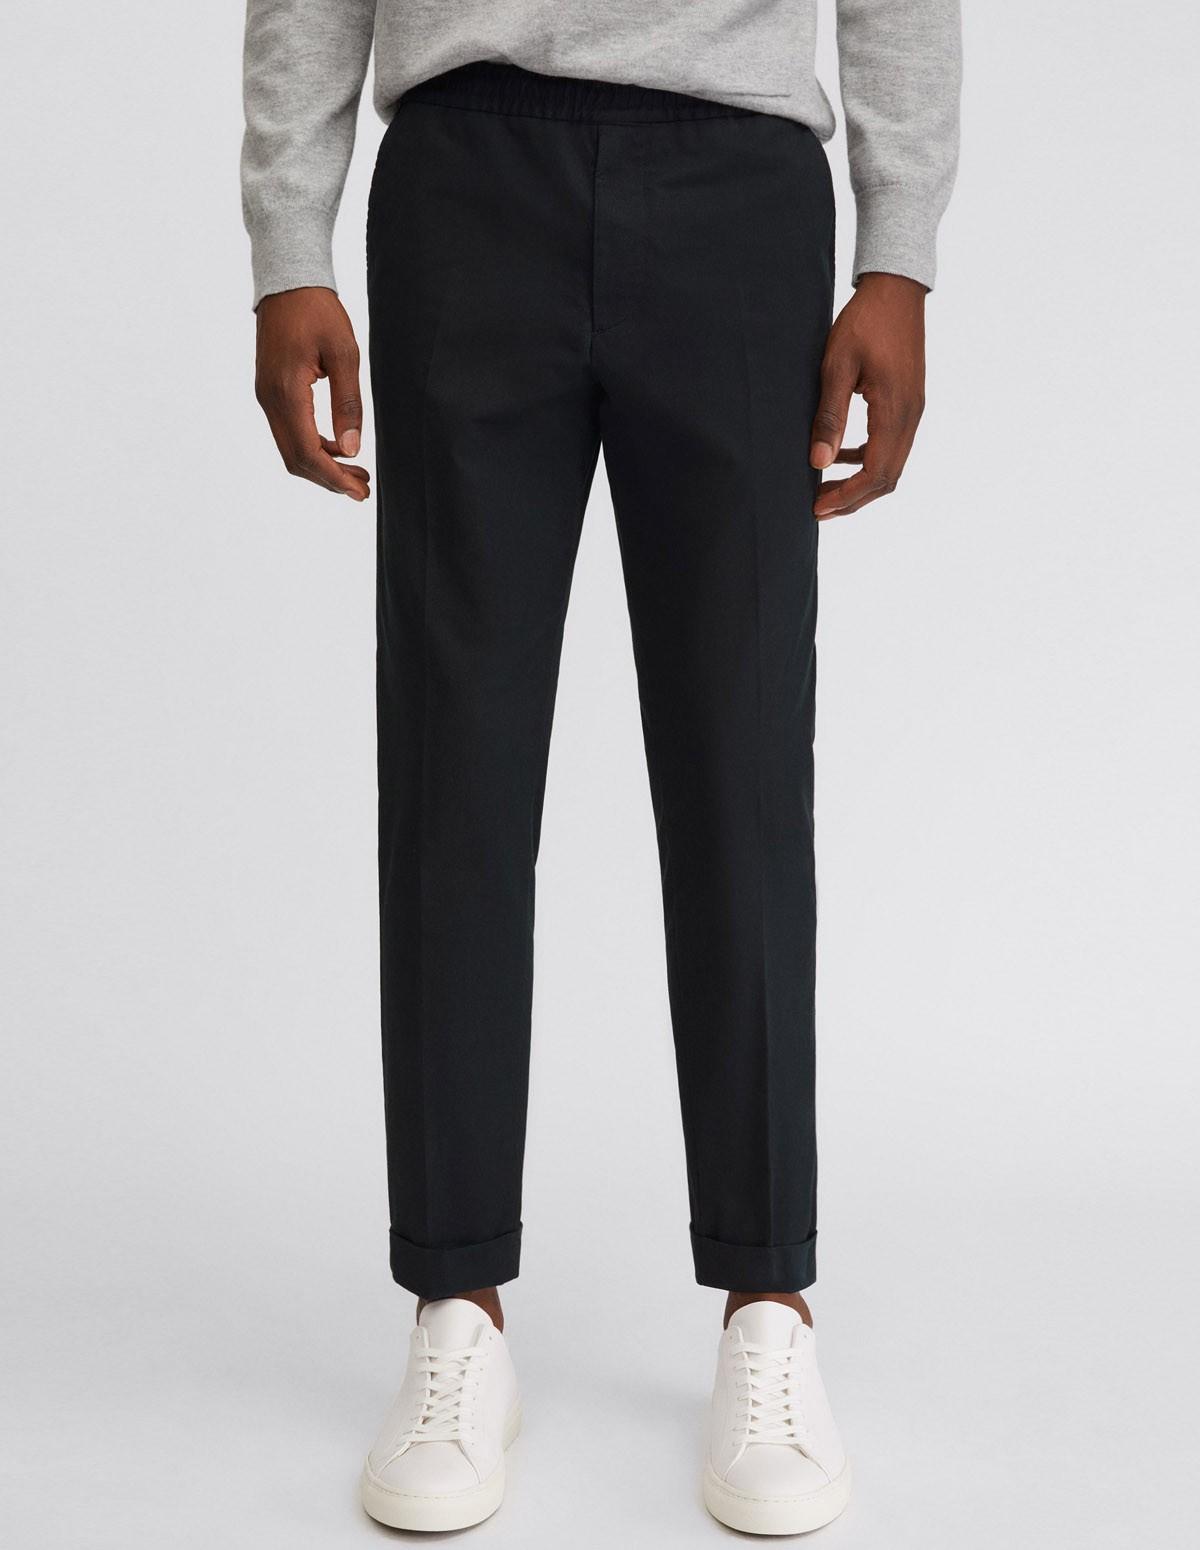 Fk Terry Cotton Trouser - BLACK 1433